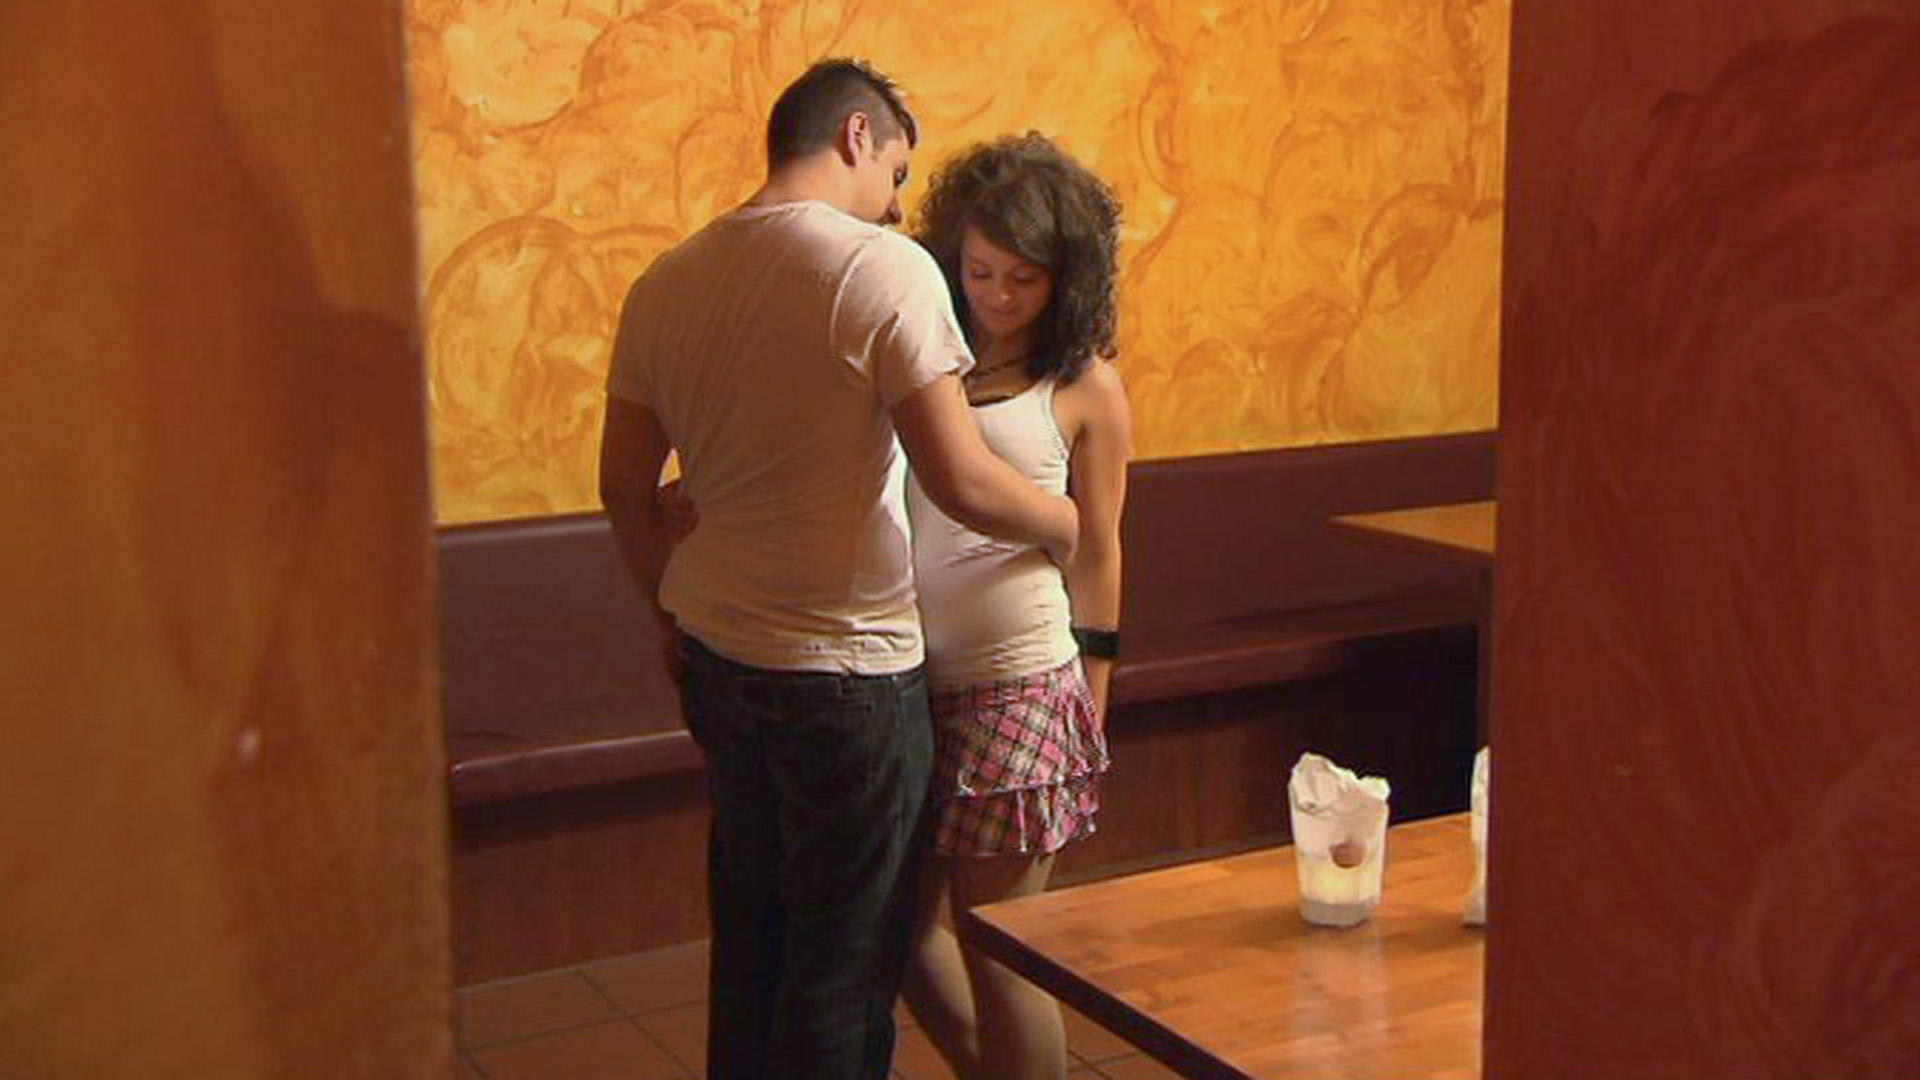 17-jährige Tochter baggert ständig alle Männer an | Folge 62